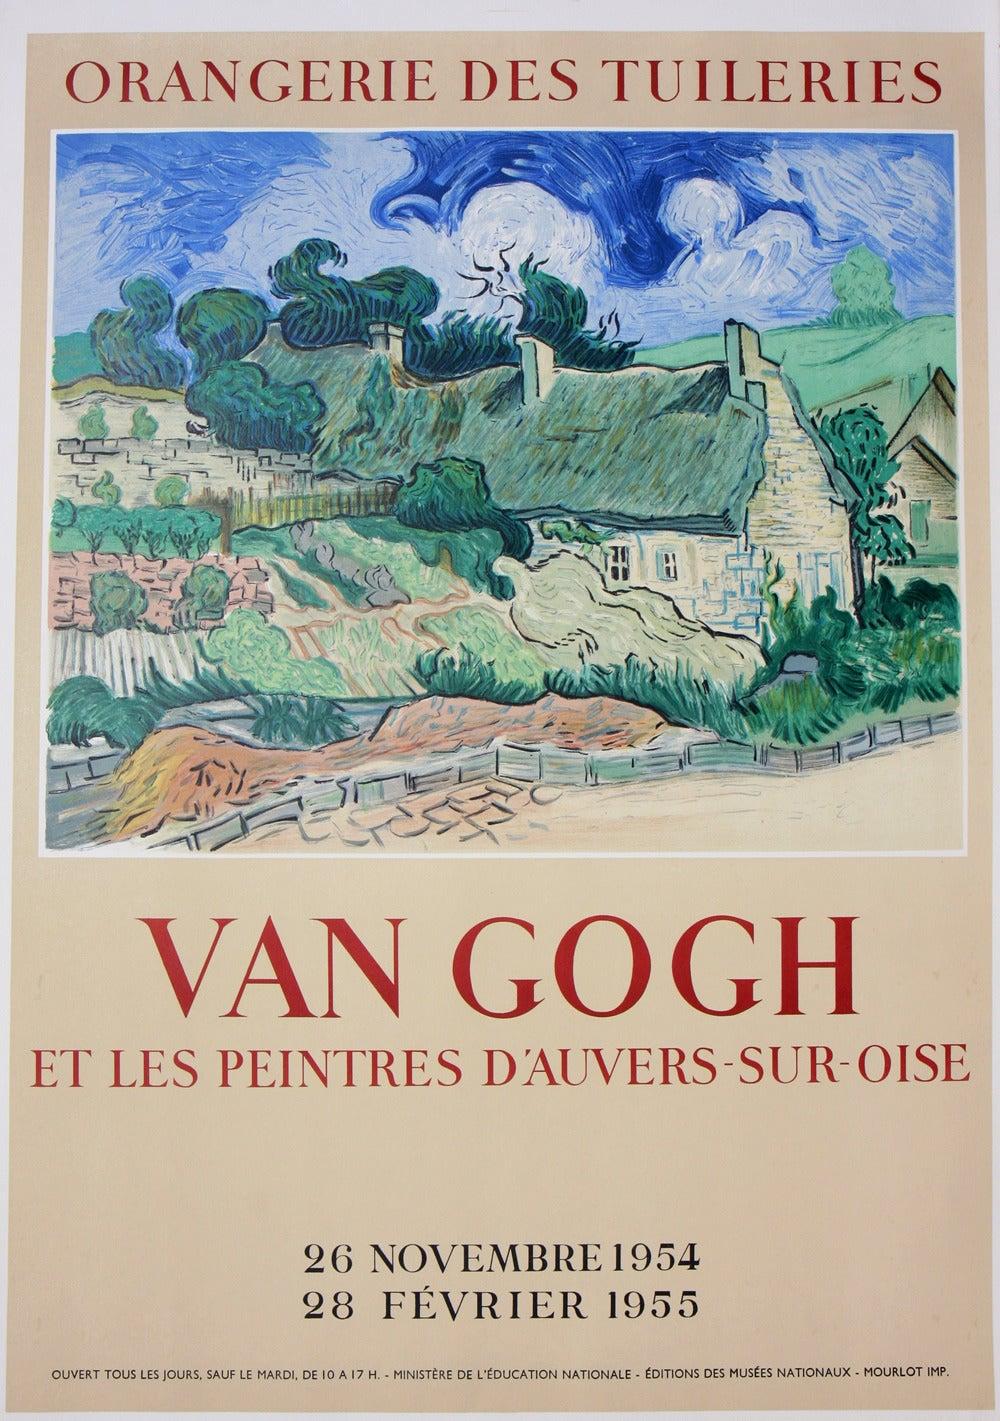 Vincent van Gogh - Van Gogh Poster: Orangerie Des Tuileries, Print ...